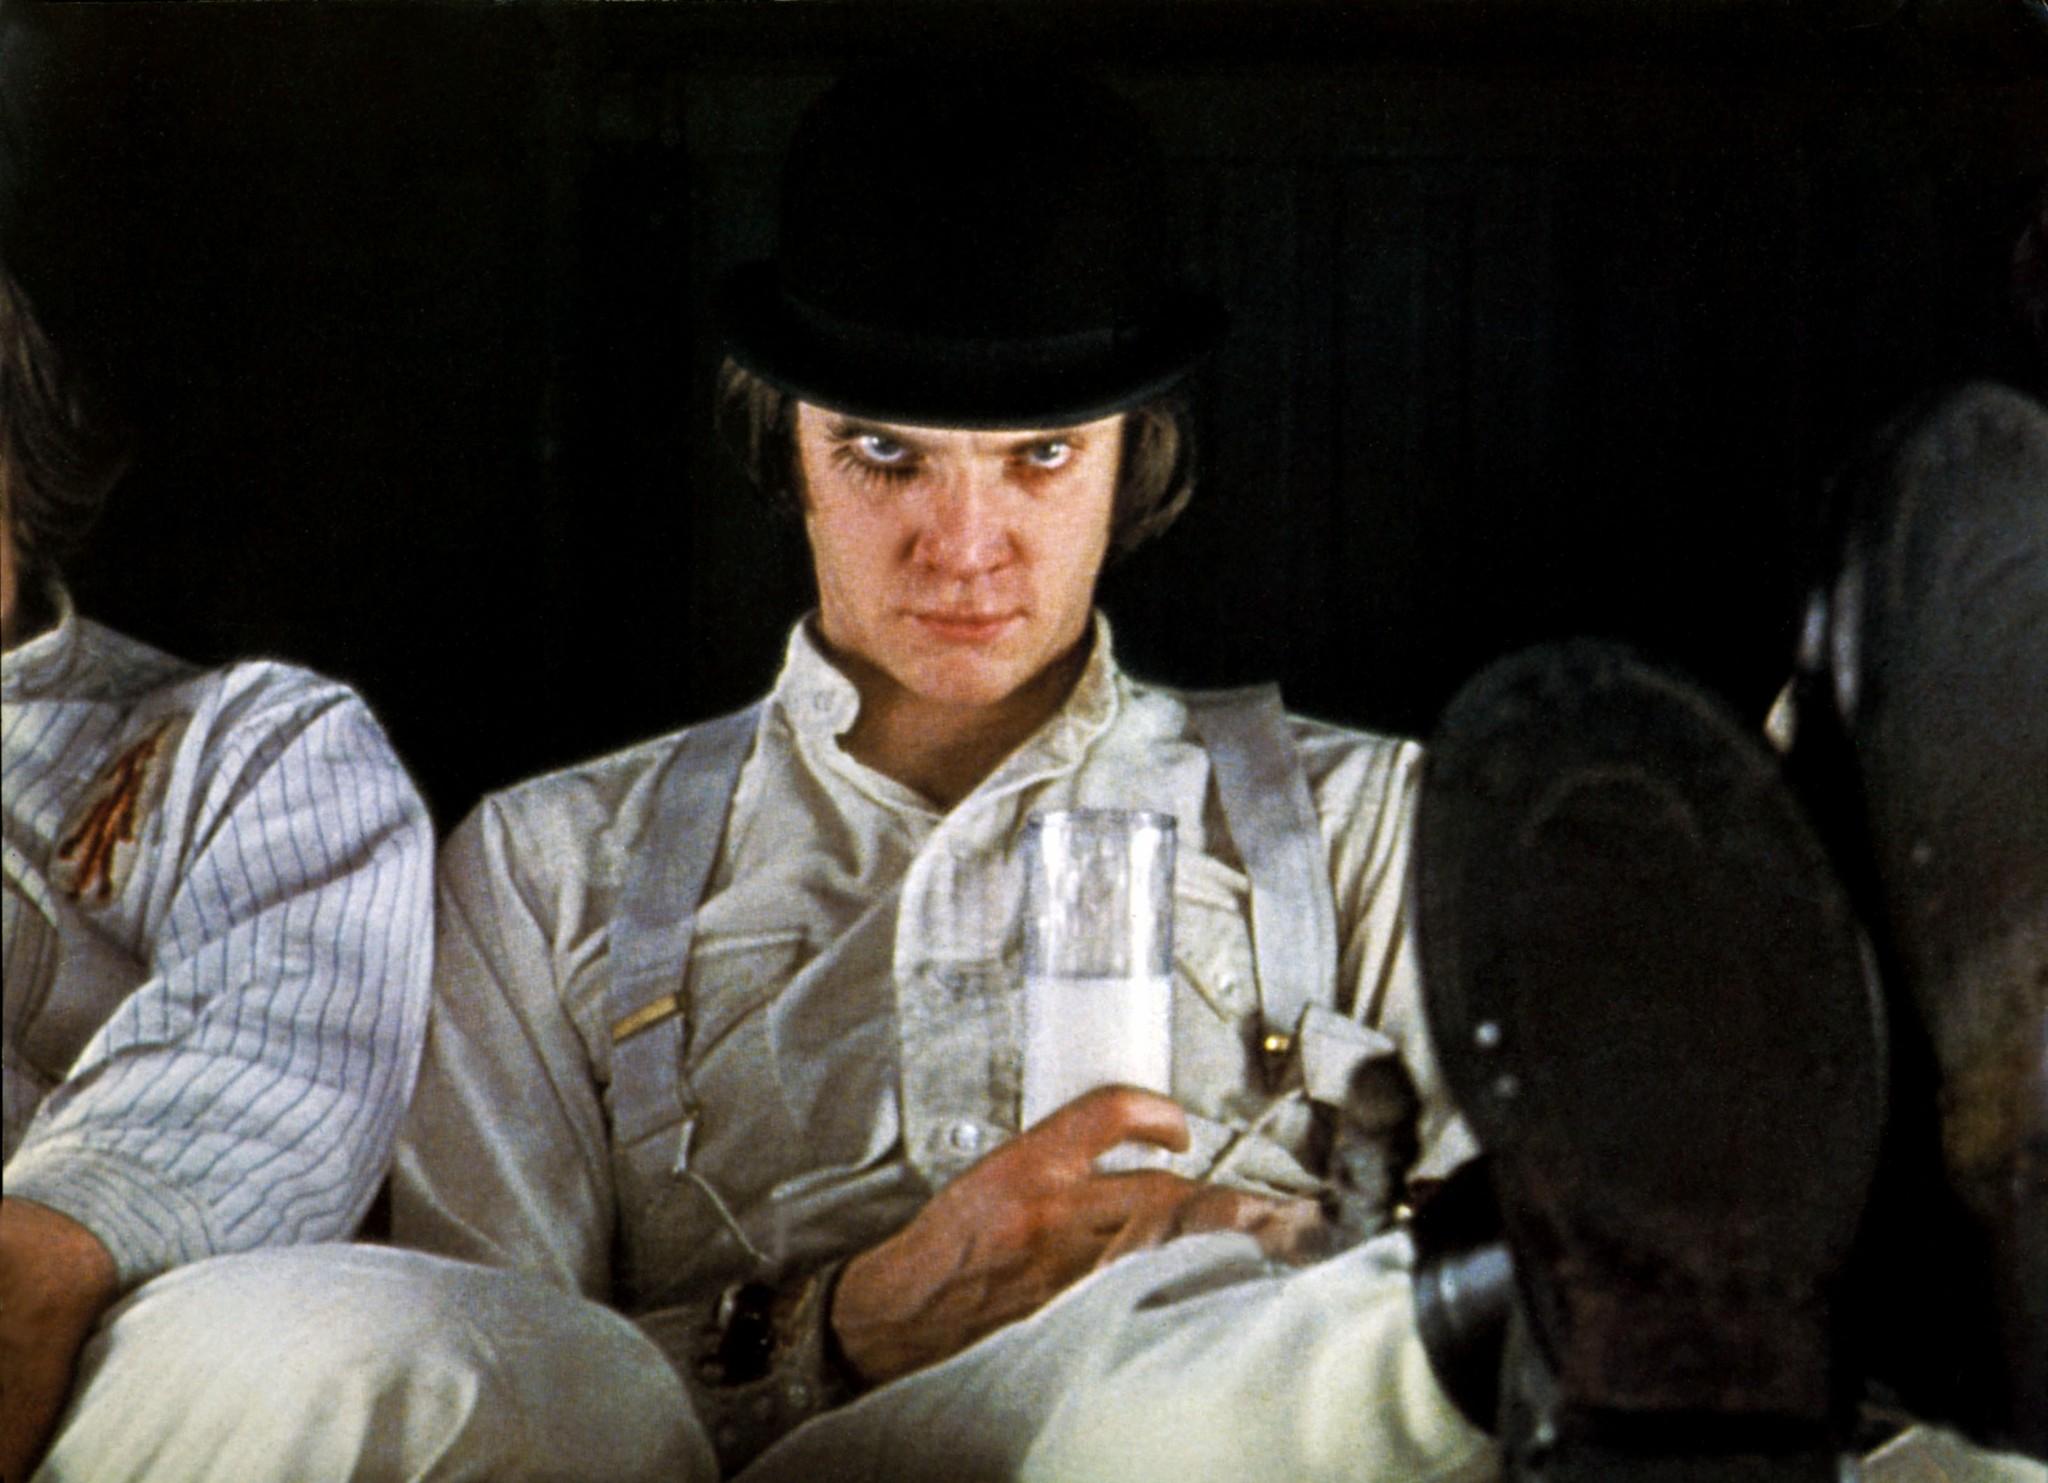 A Clockwork Orange 1 Dangerous Movie Production Moments That Could Never Happen Today